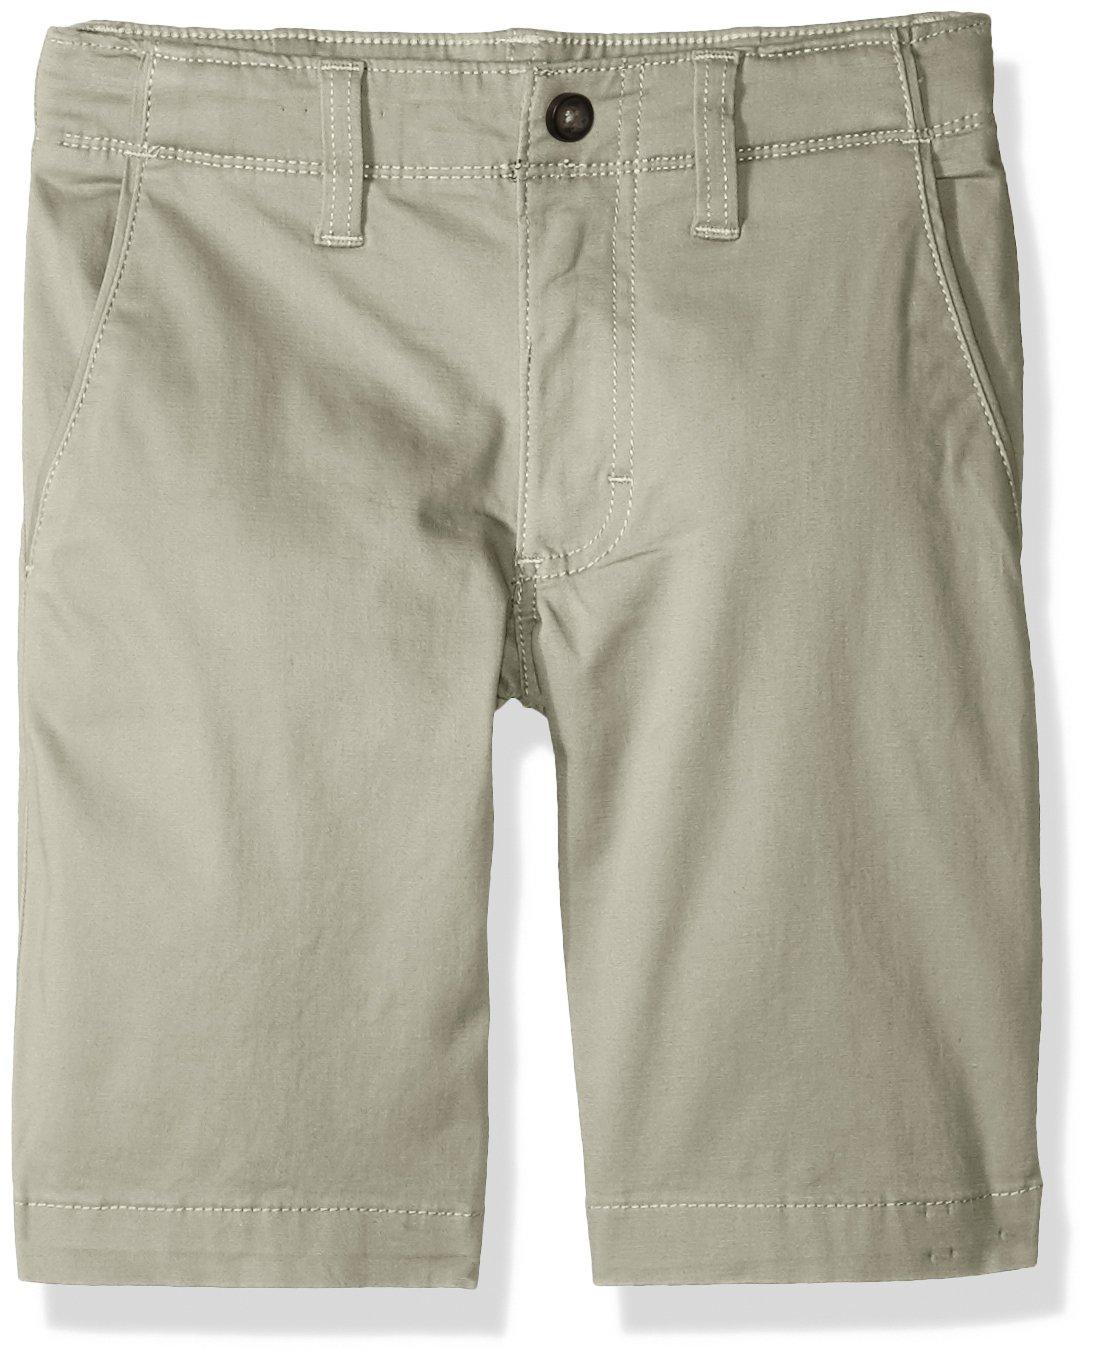 LEE Boys' Big Extreme Comfort Chino Short, Stone, 12 Regular